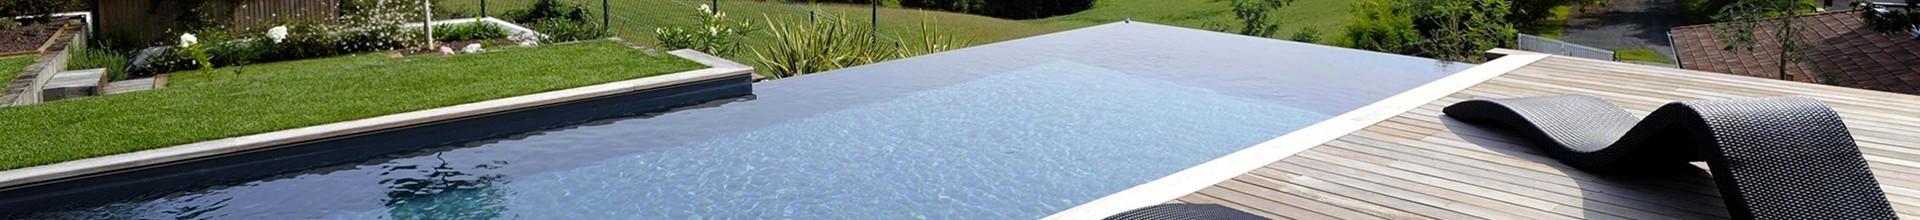 Direct usine, piscine coque prix Puy-de-Dôme